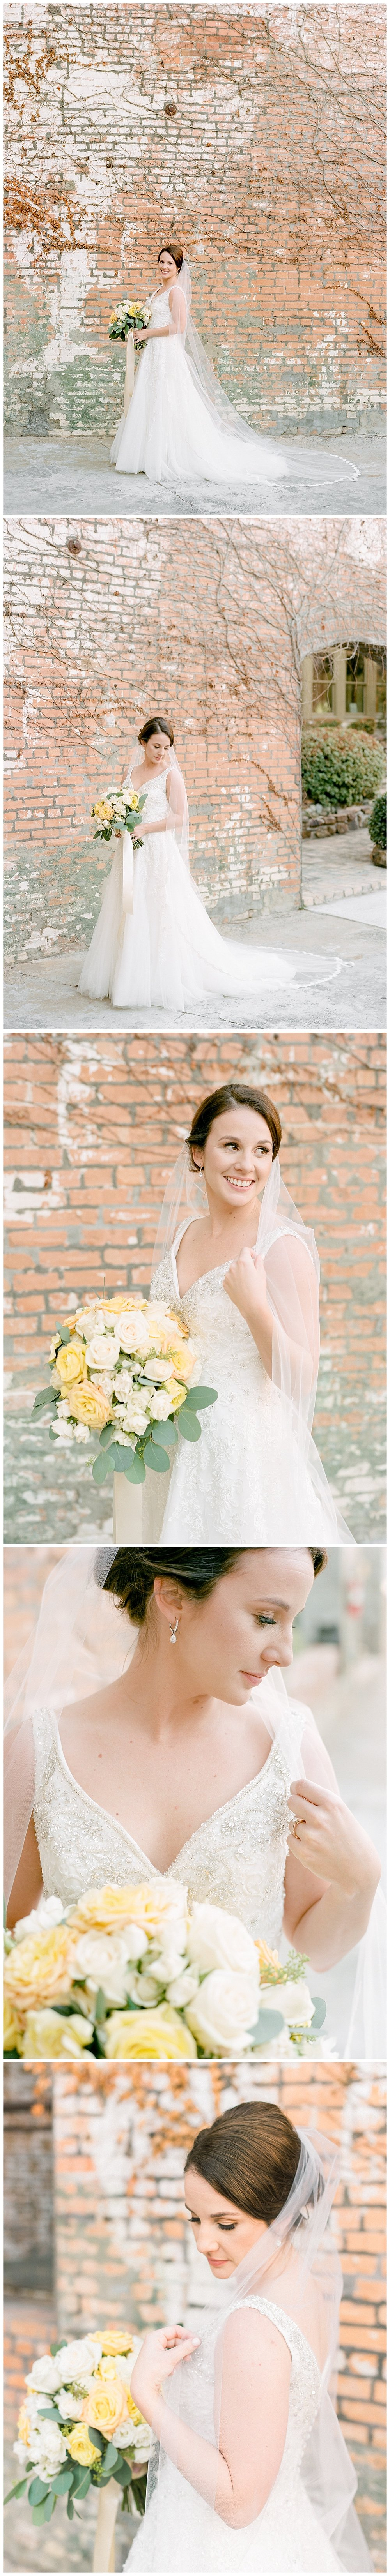 the-cotton-mill-wedding-ar-photography-7.jpg